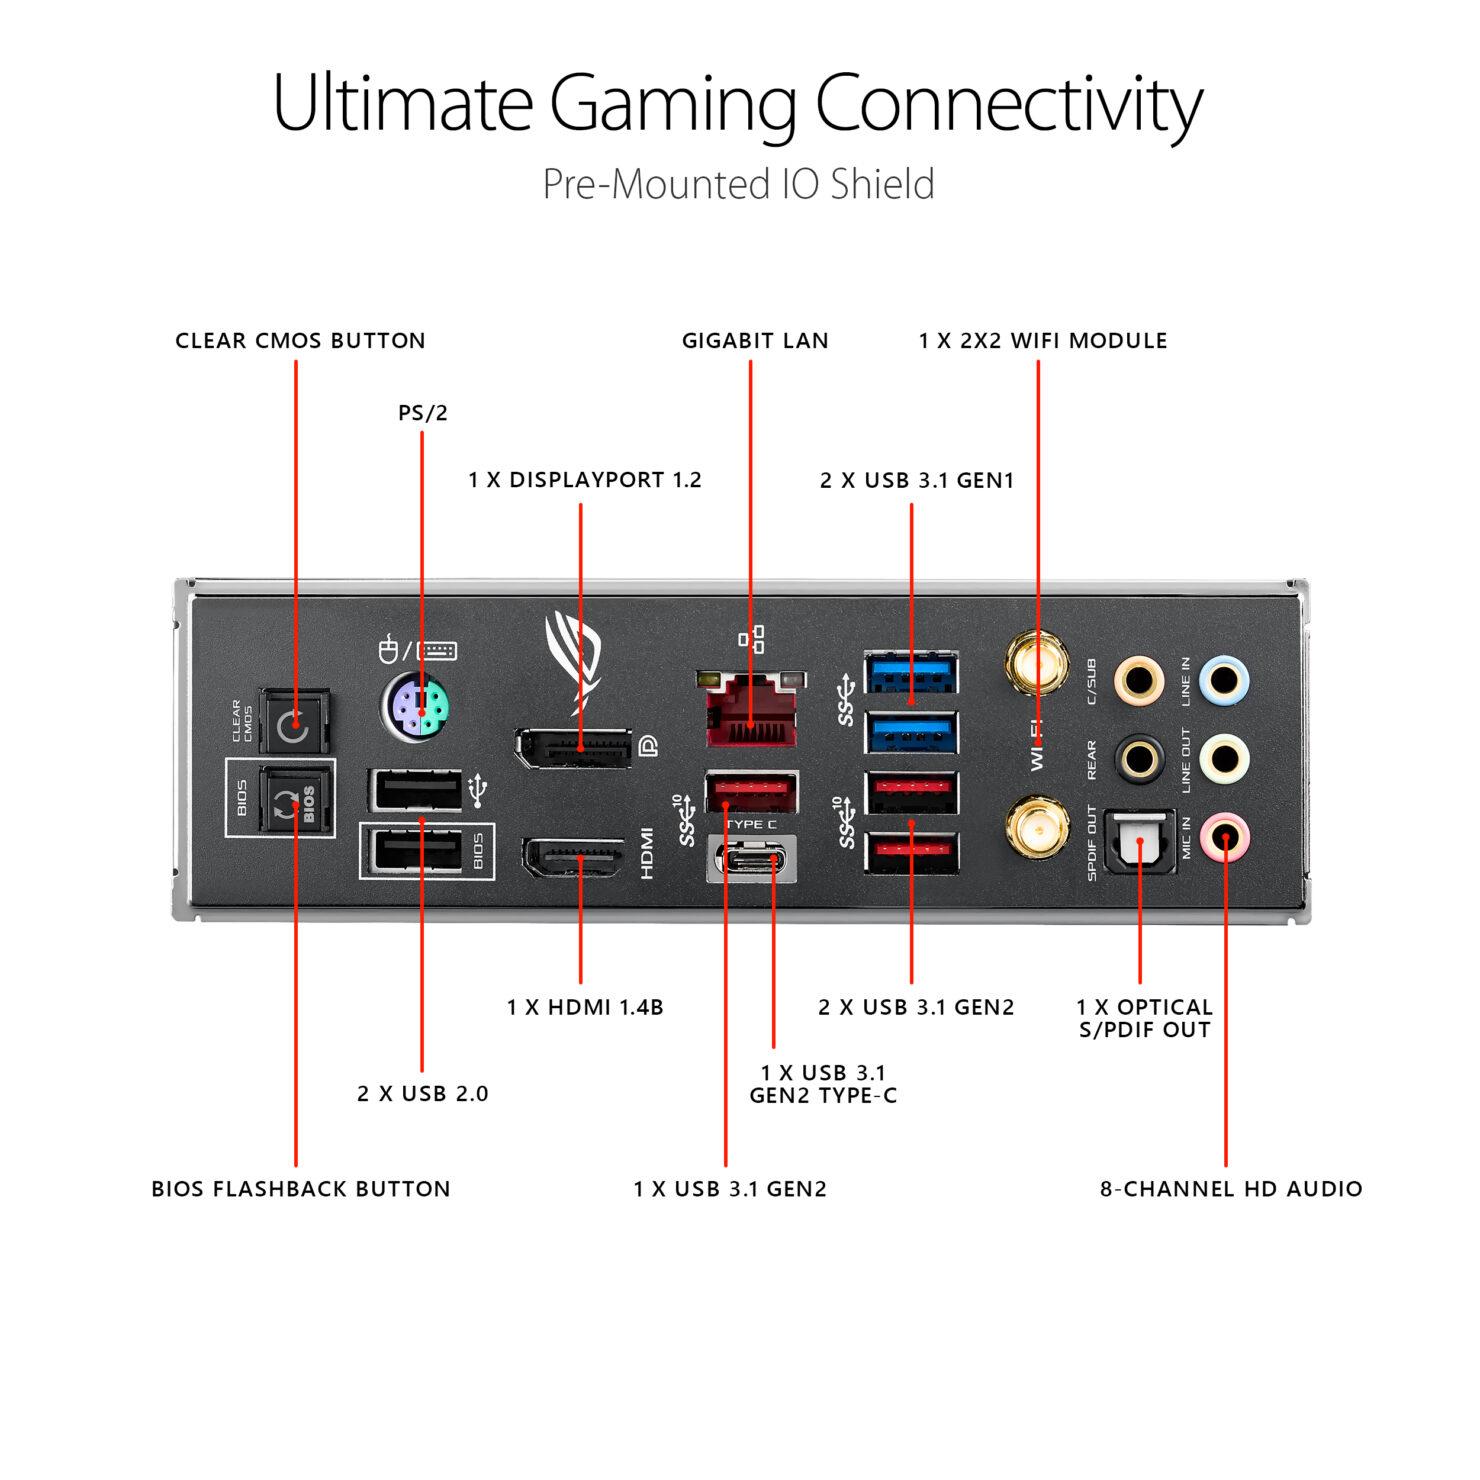 5-rog-maximus-xi-hero-wi-fi-ultimate-gaming-connectivity